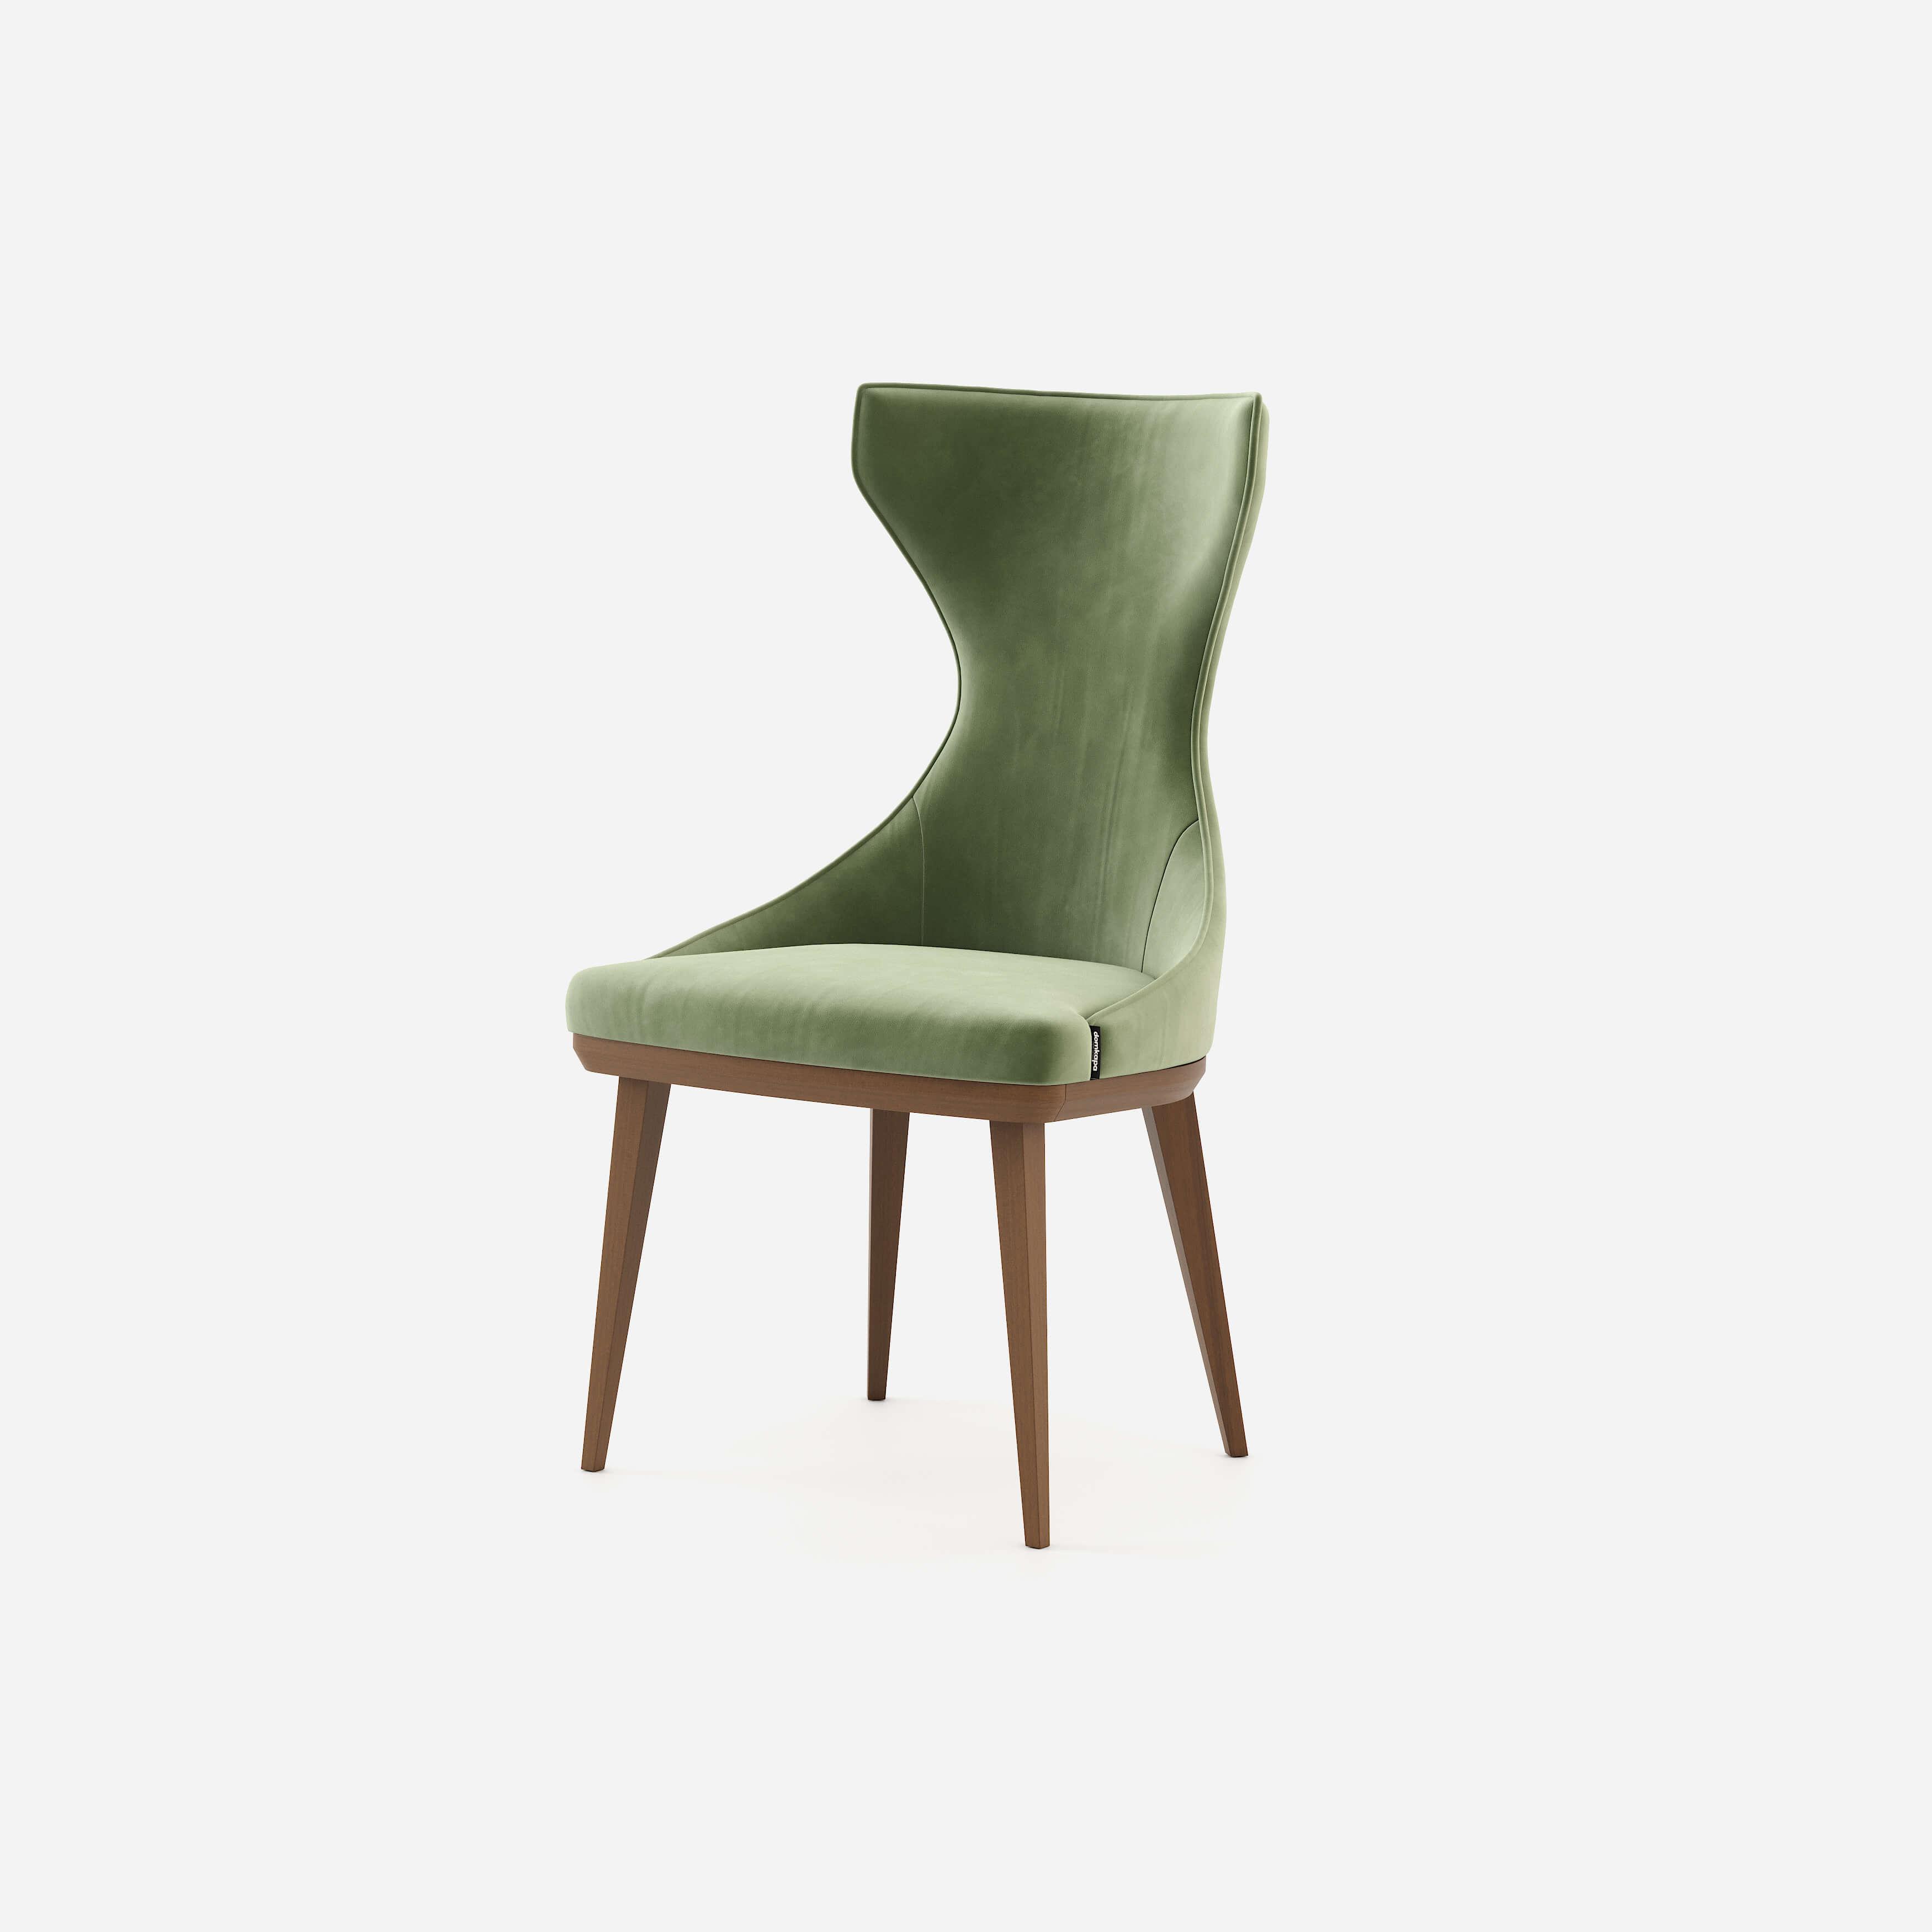 jones-chair-seating-pieces-velvet-interior-design-home-decor-domkapa-upholstered-design-furniture-1